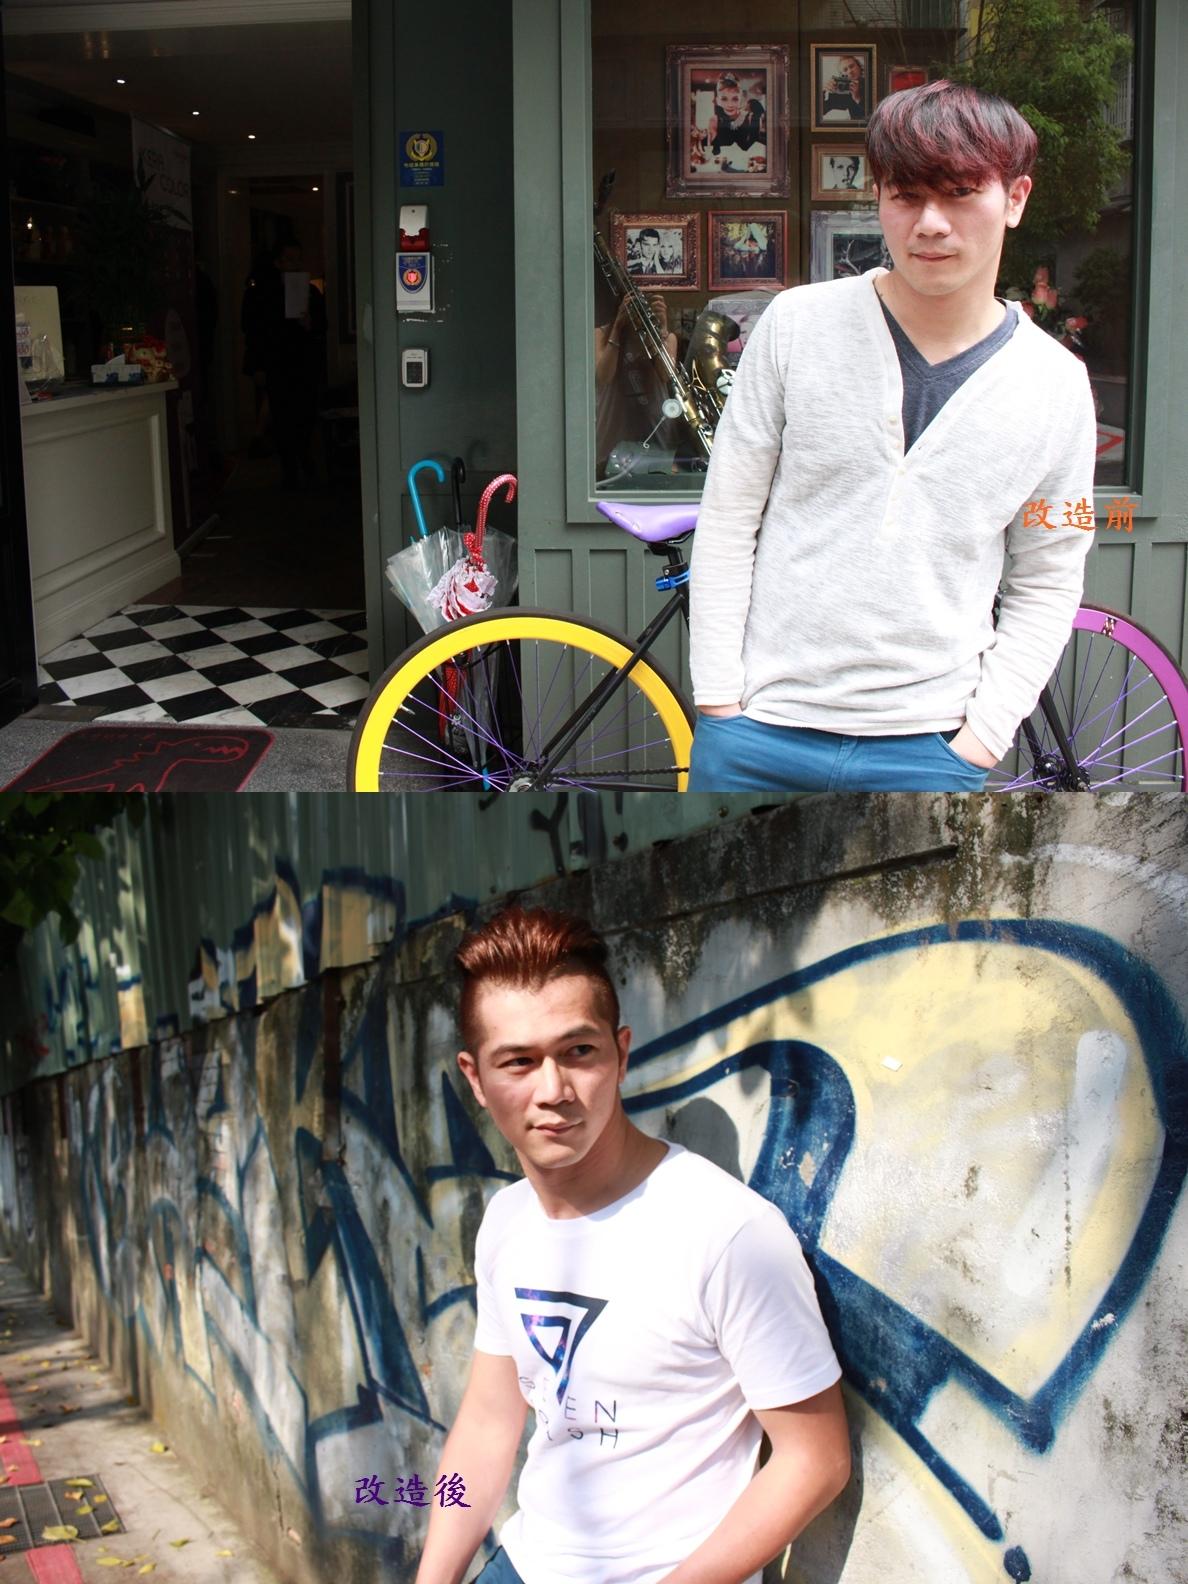 BONBONHAIRX中美嬌兒法國品牌EP染膏2015春下發表 (1)